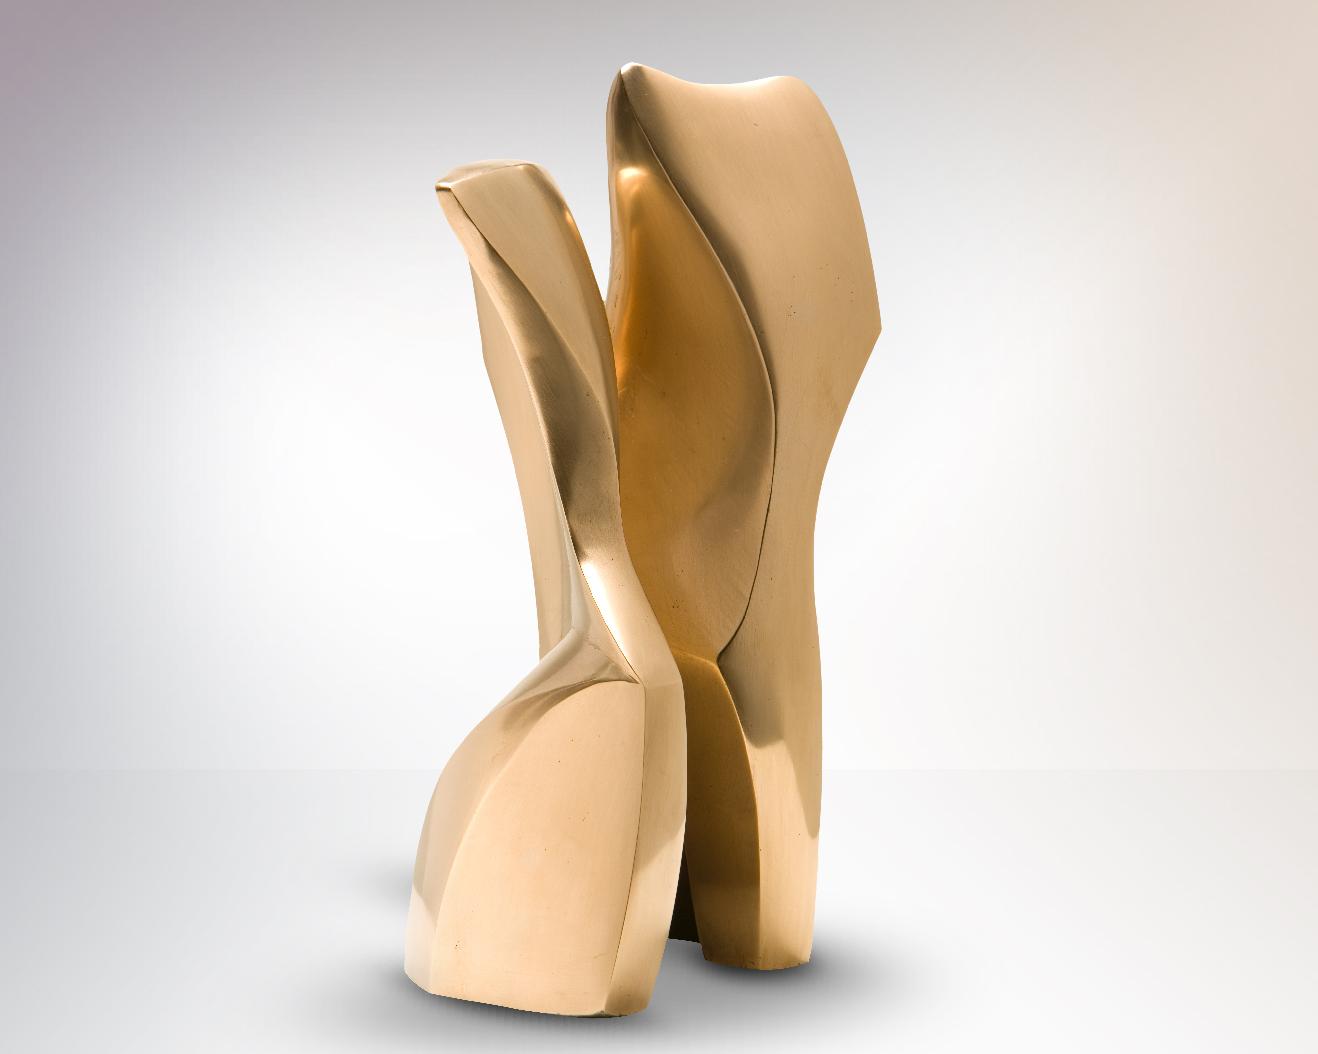 Carola_Eggeling_art_sculpture_Danza